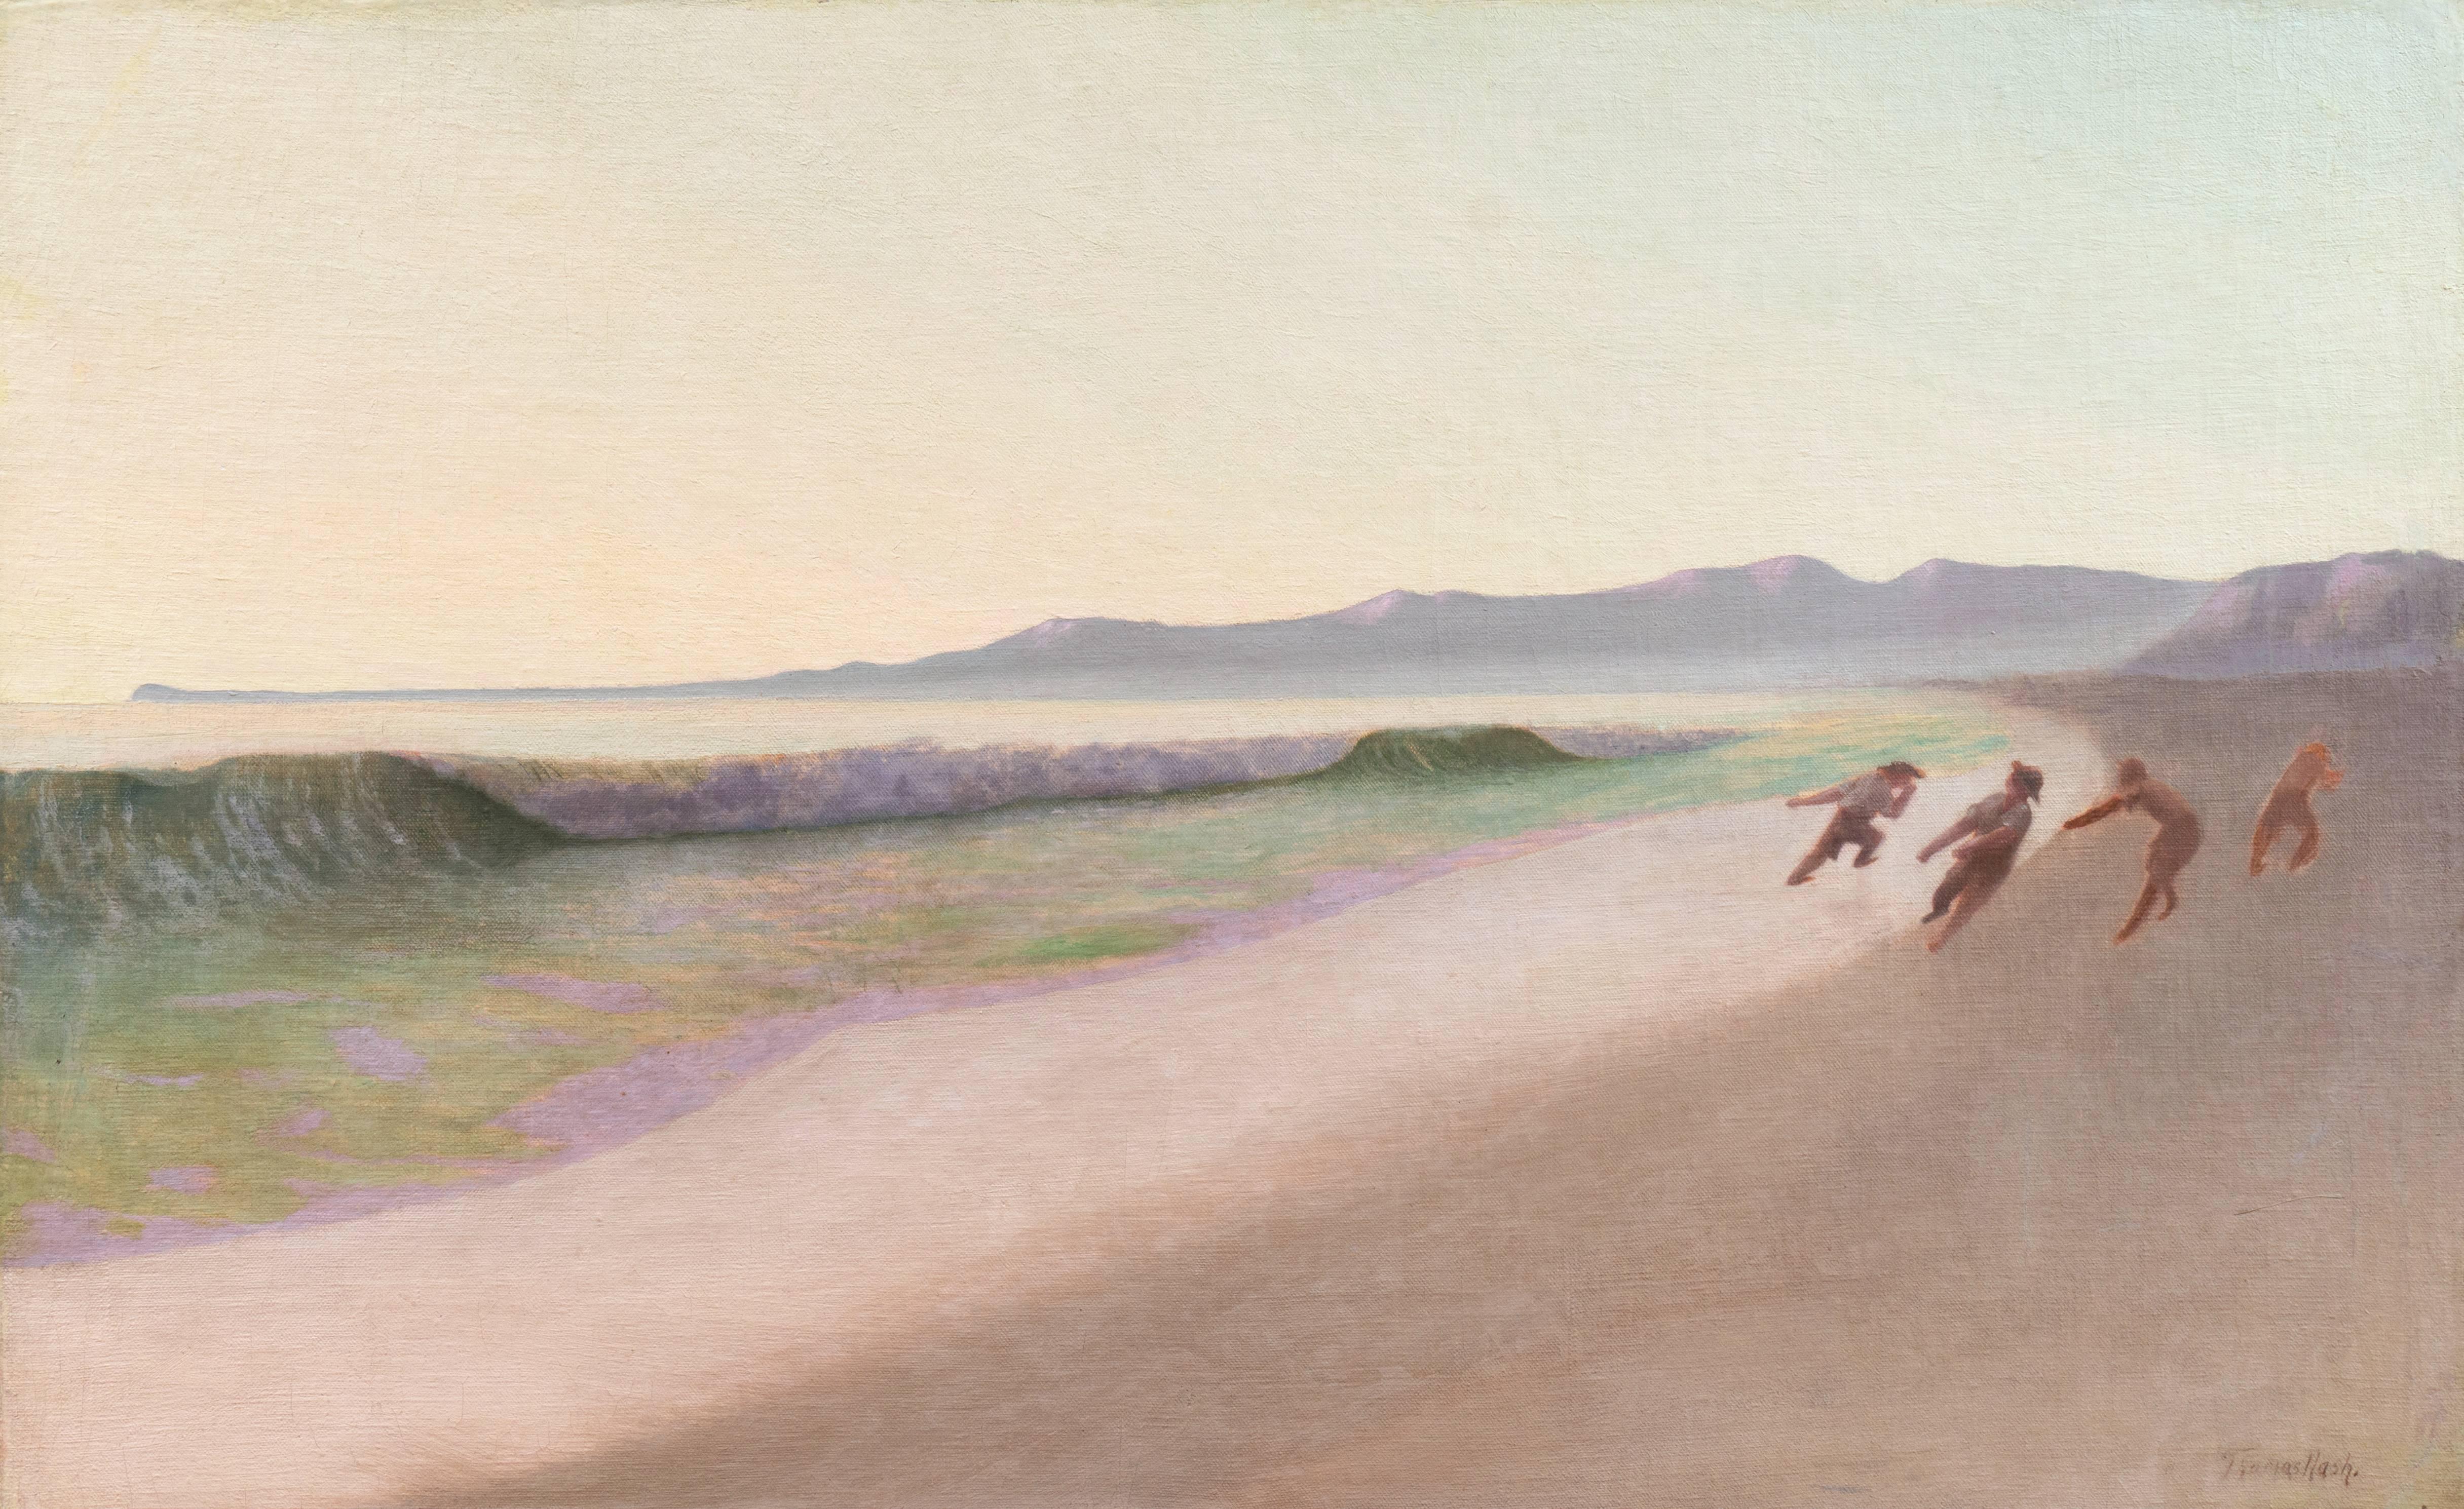 'Fishermen on Hermosa Beach' Large & Early Los Angeles California Modernist Oil